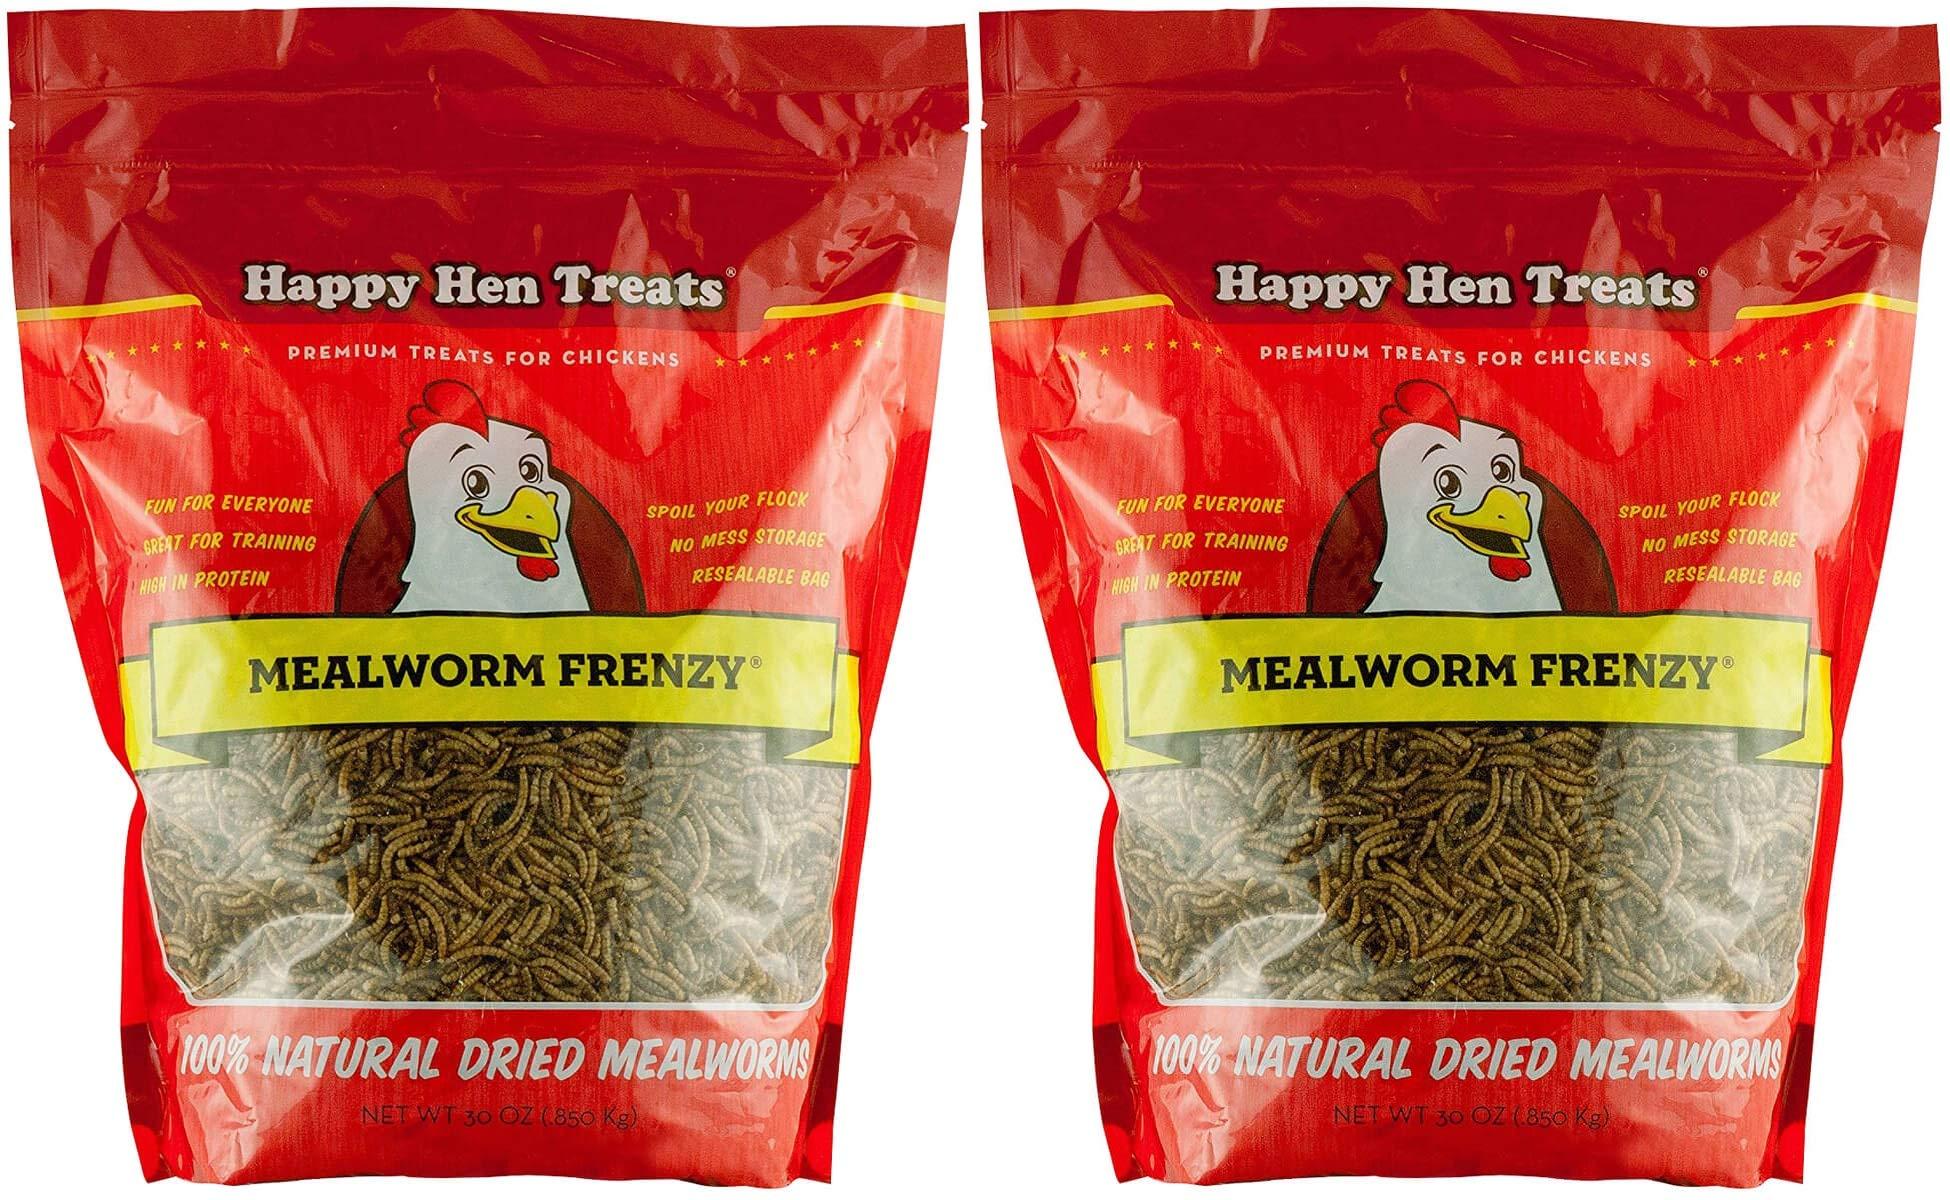 Happy Hen Treats Mealworm Frenzy, 30-Ounce (2 Pack) by Happy Hen